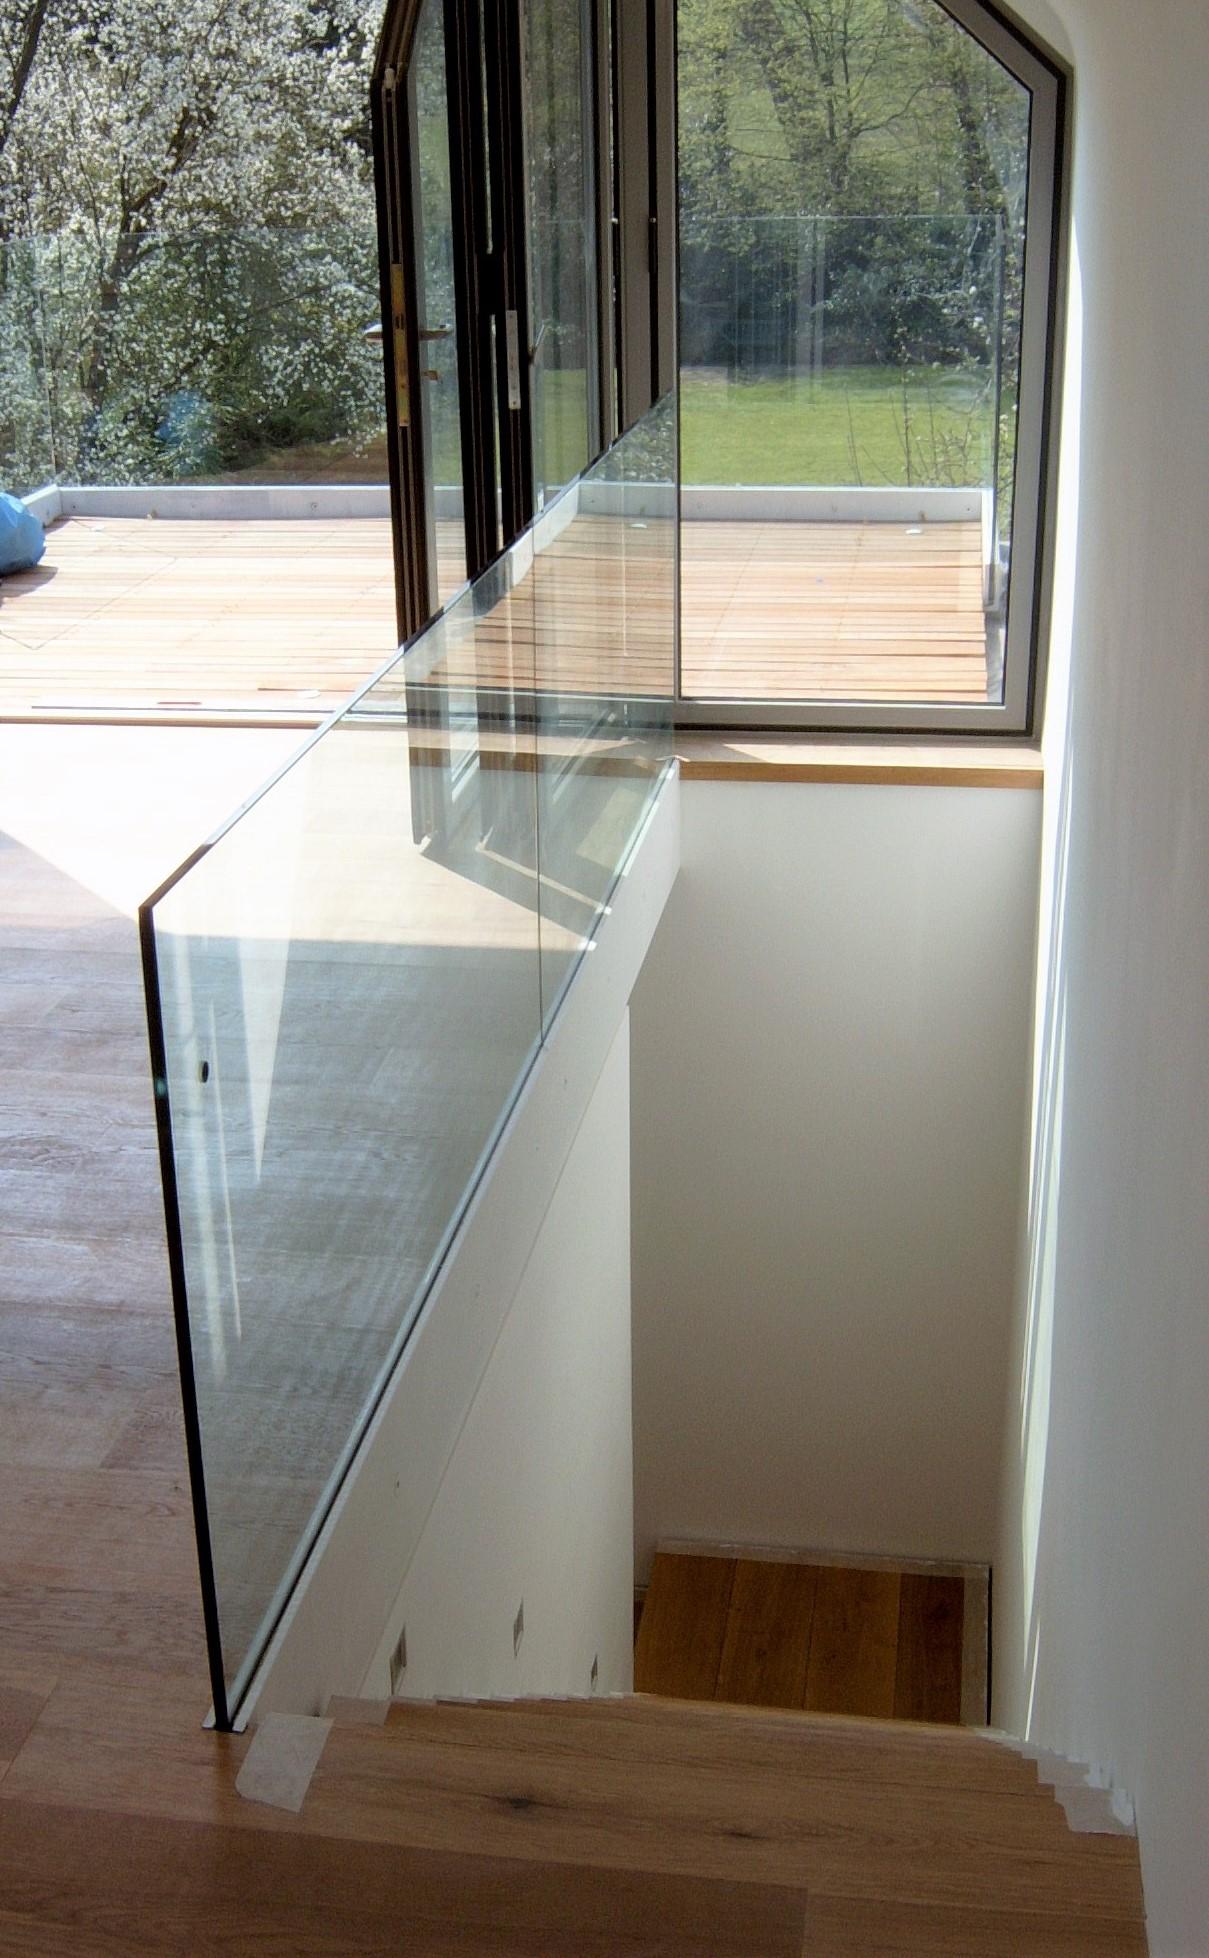 Attic conversion, frameless glass balustrade